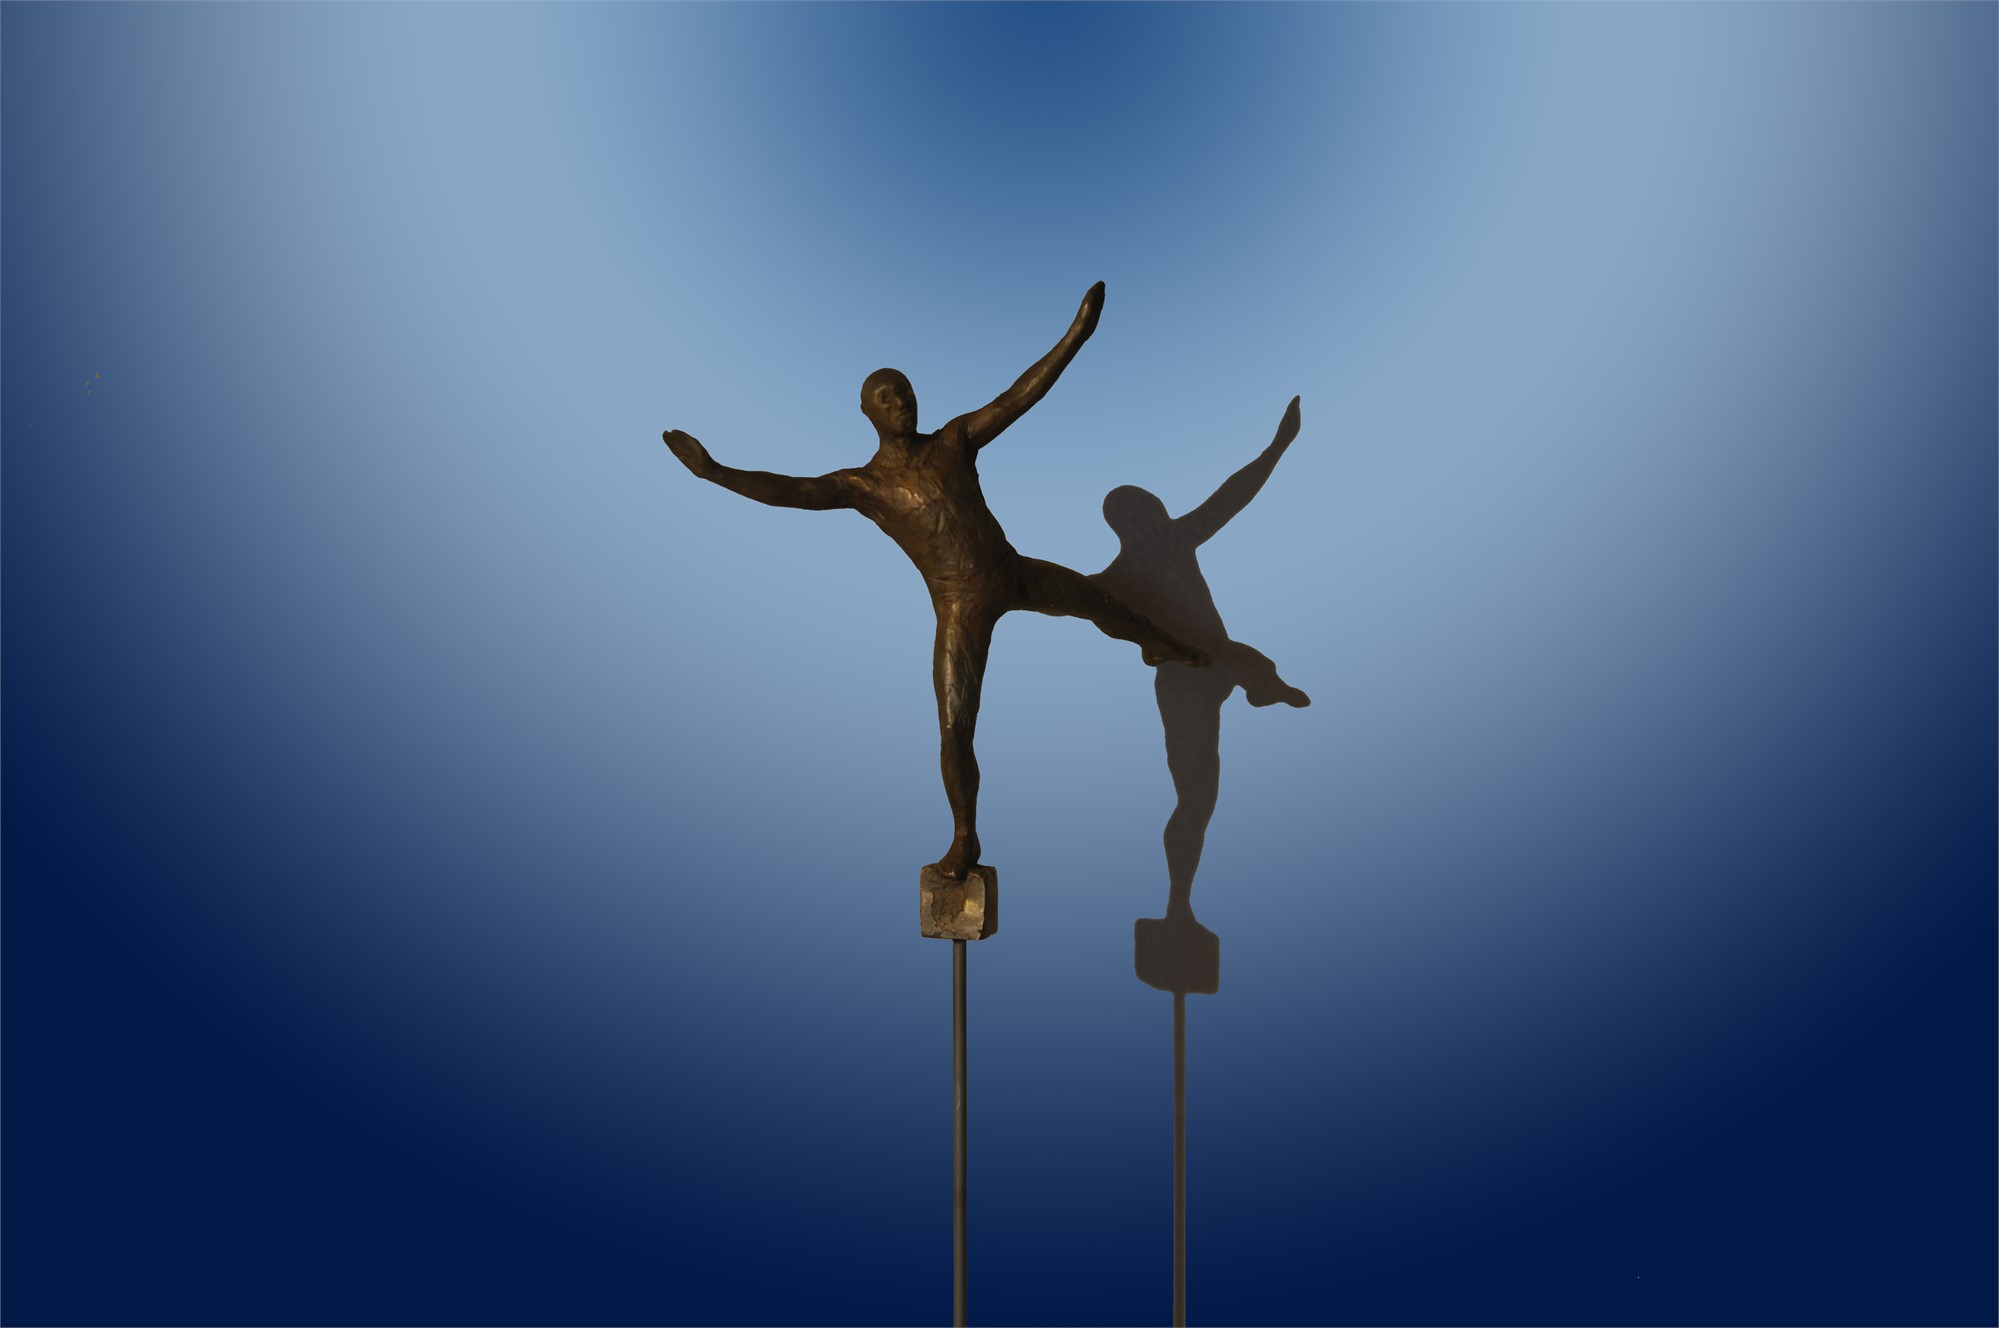 Balance Series: Foot by Bill Starke